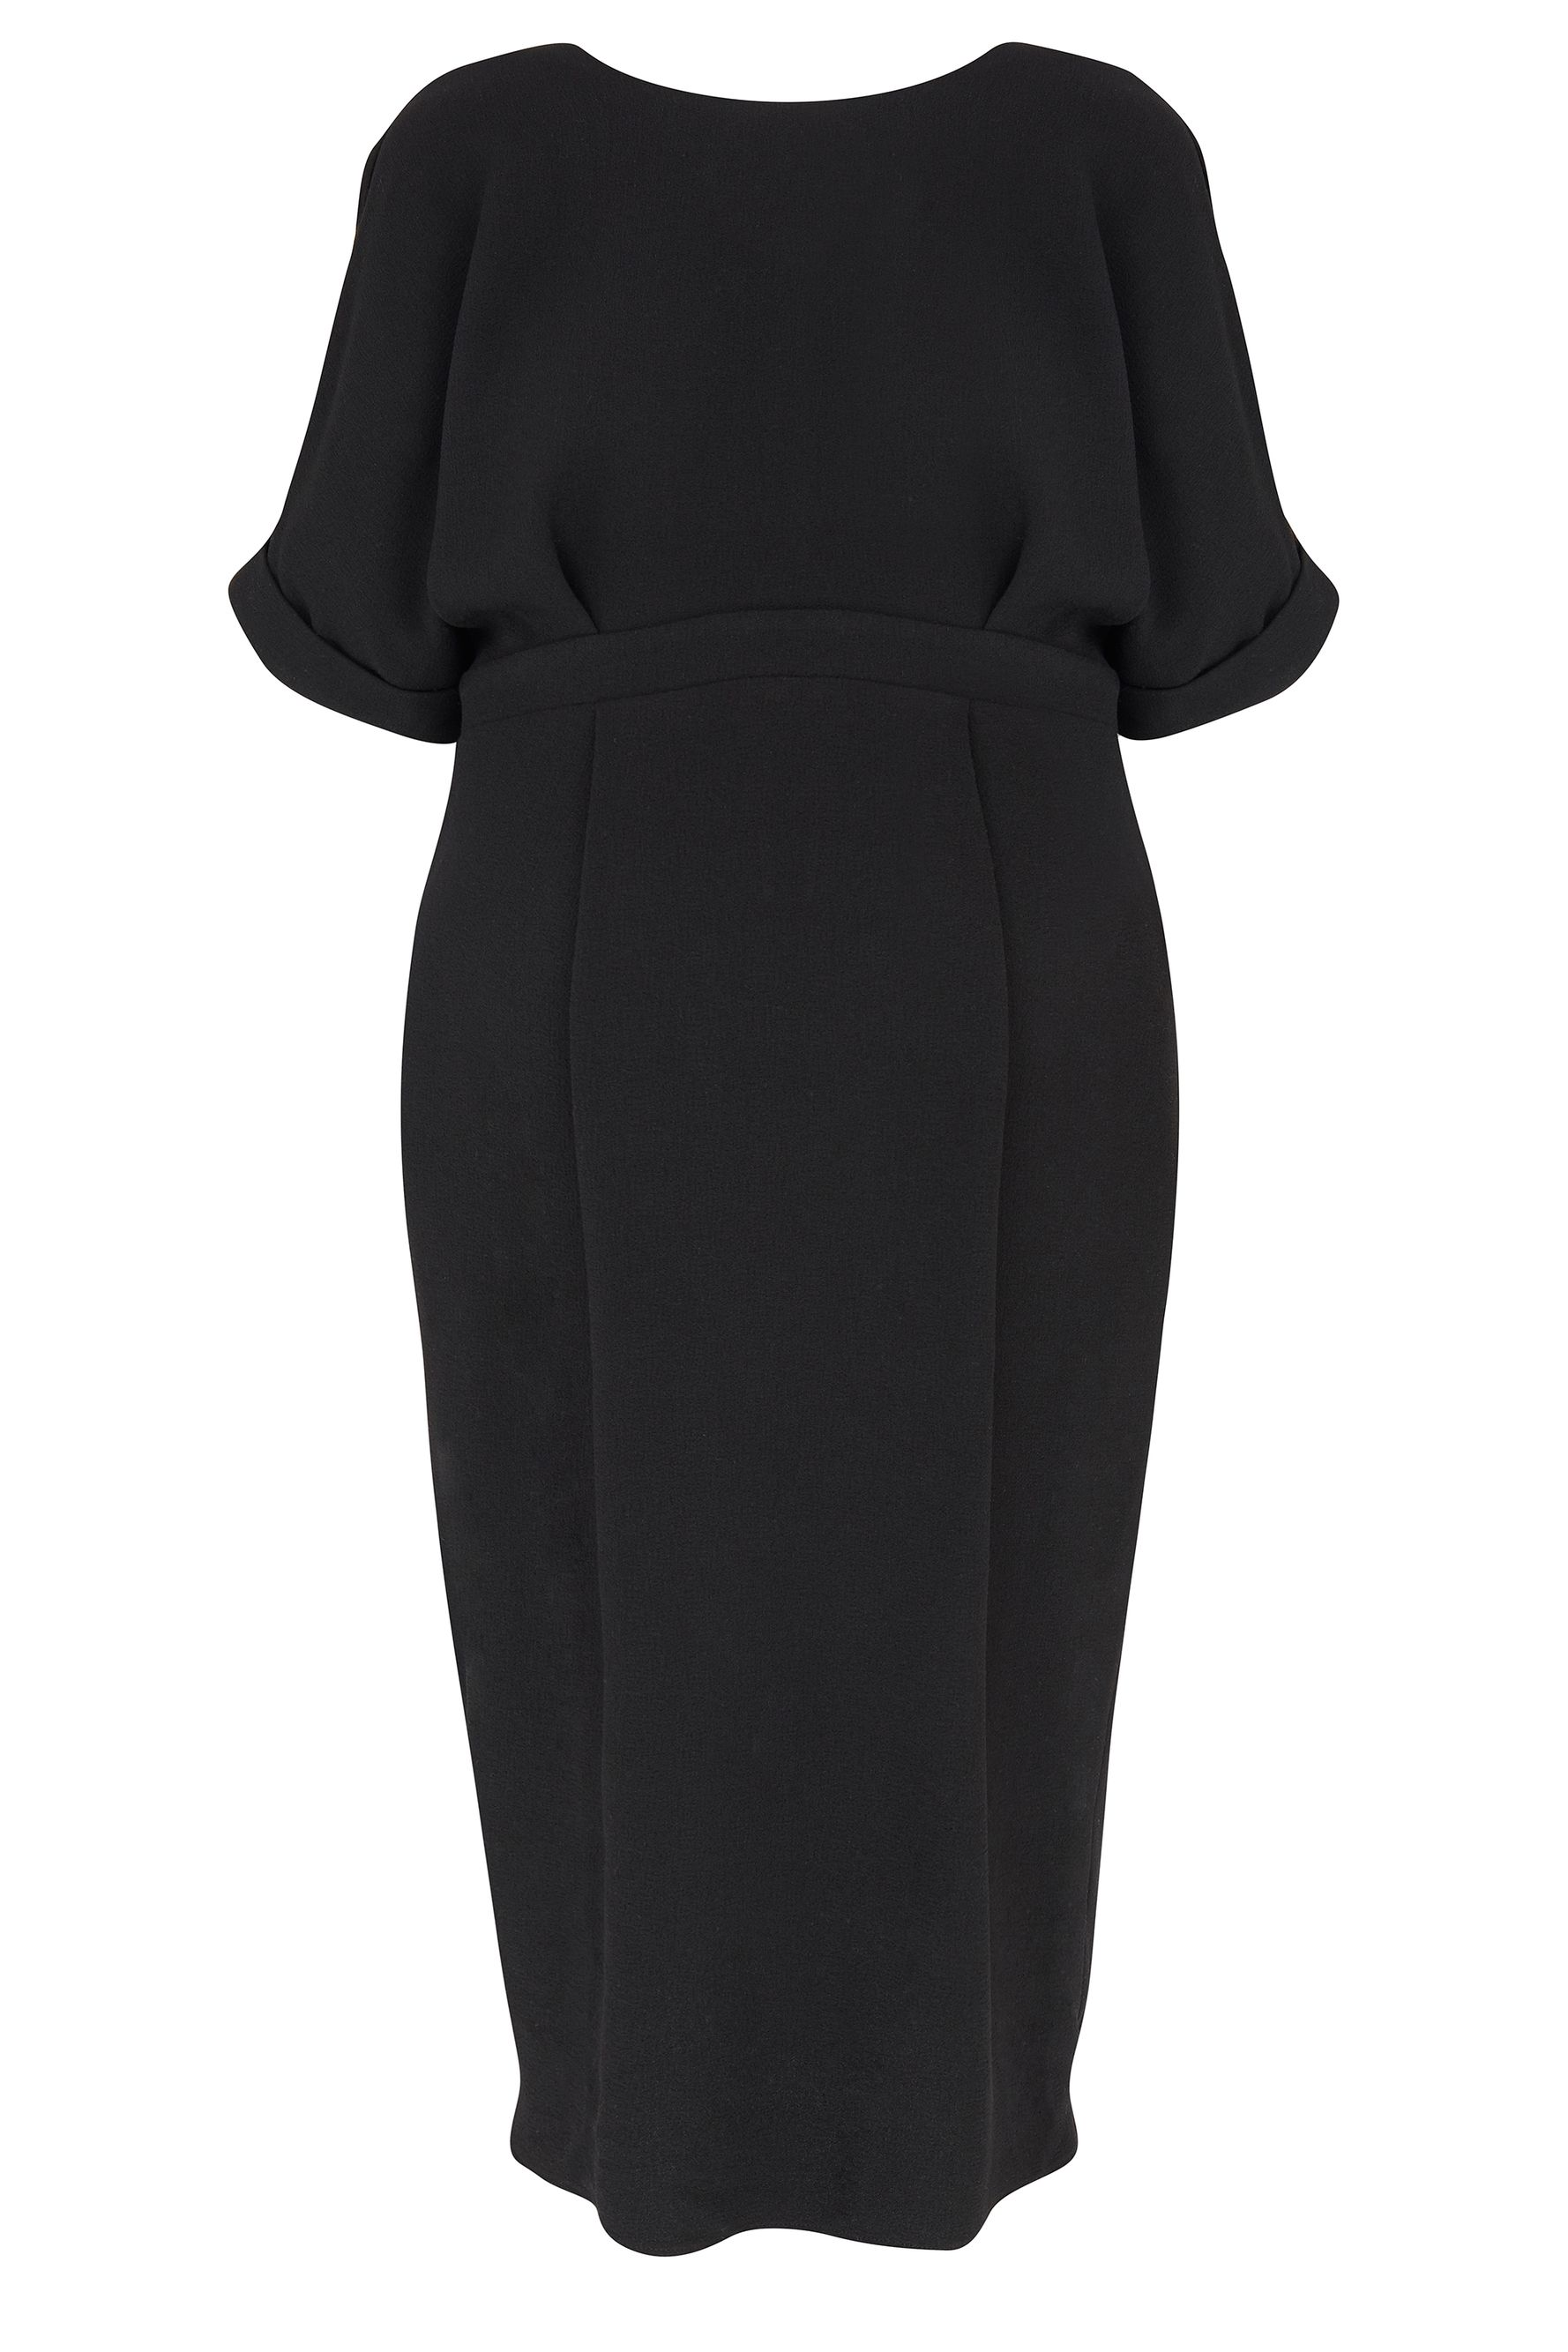 Новое платье герцогини Меган Маркл 1